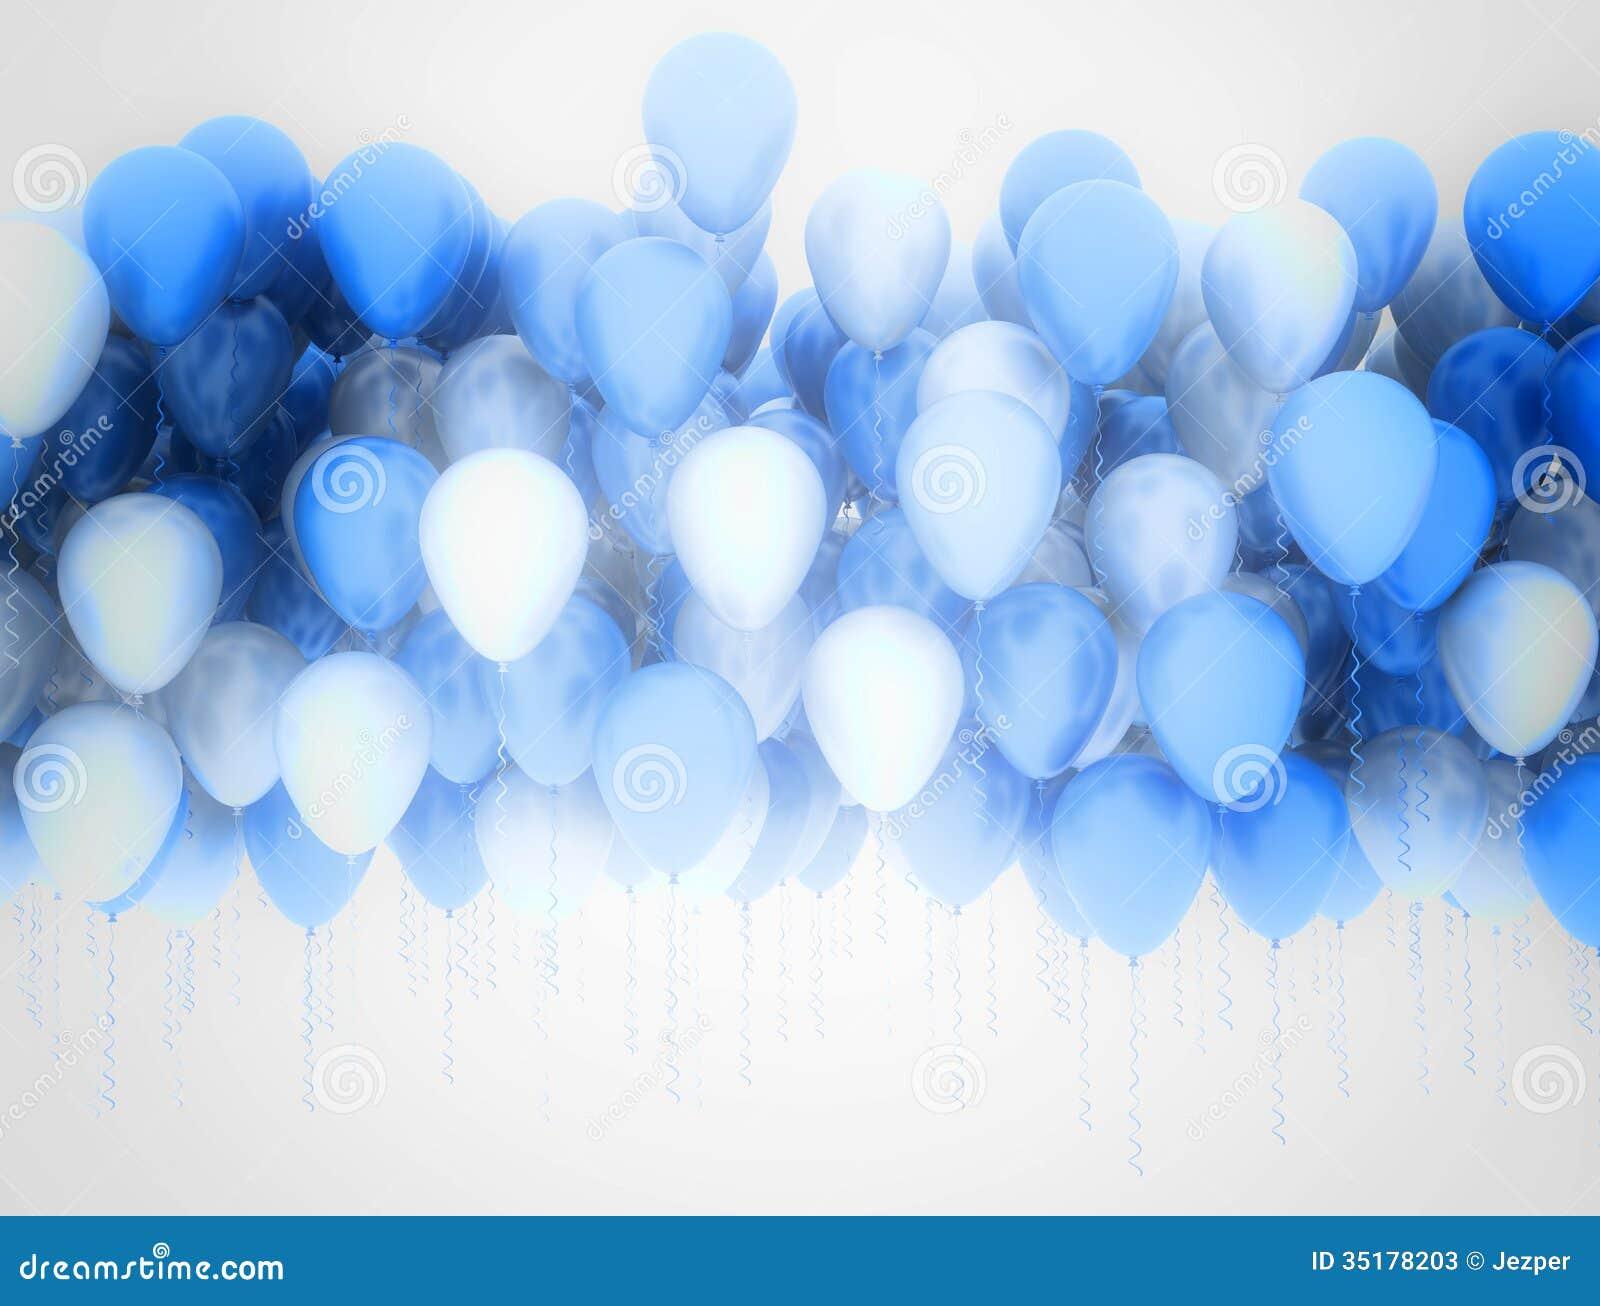 party balloons background stock illustration illustration of blue